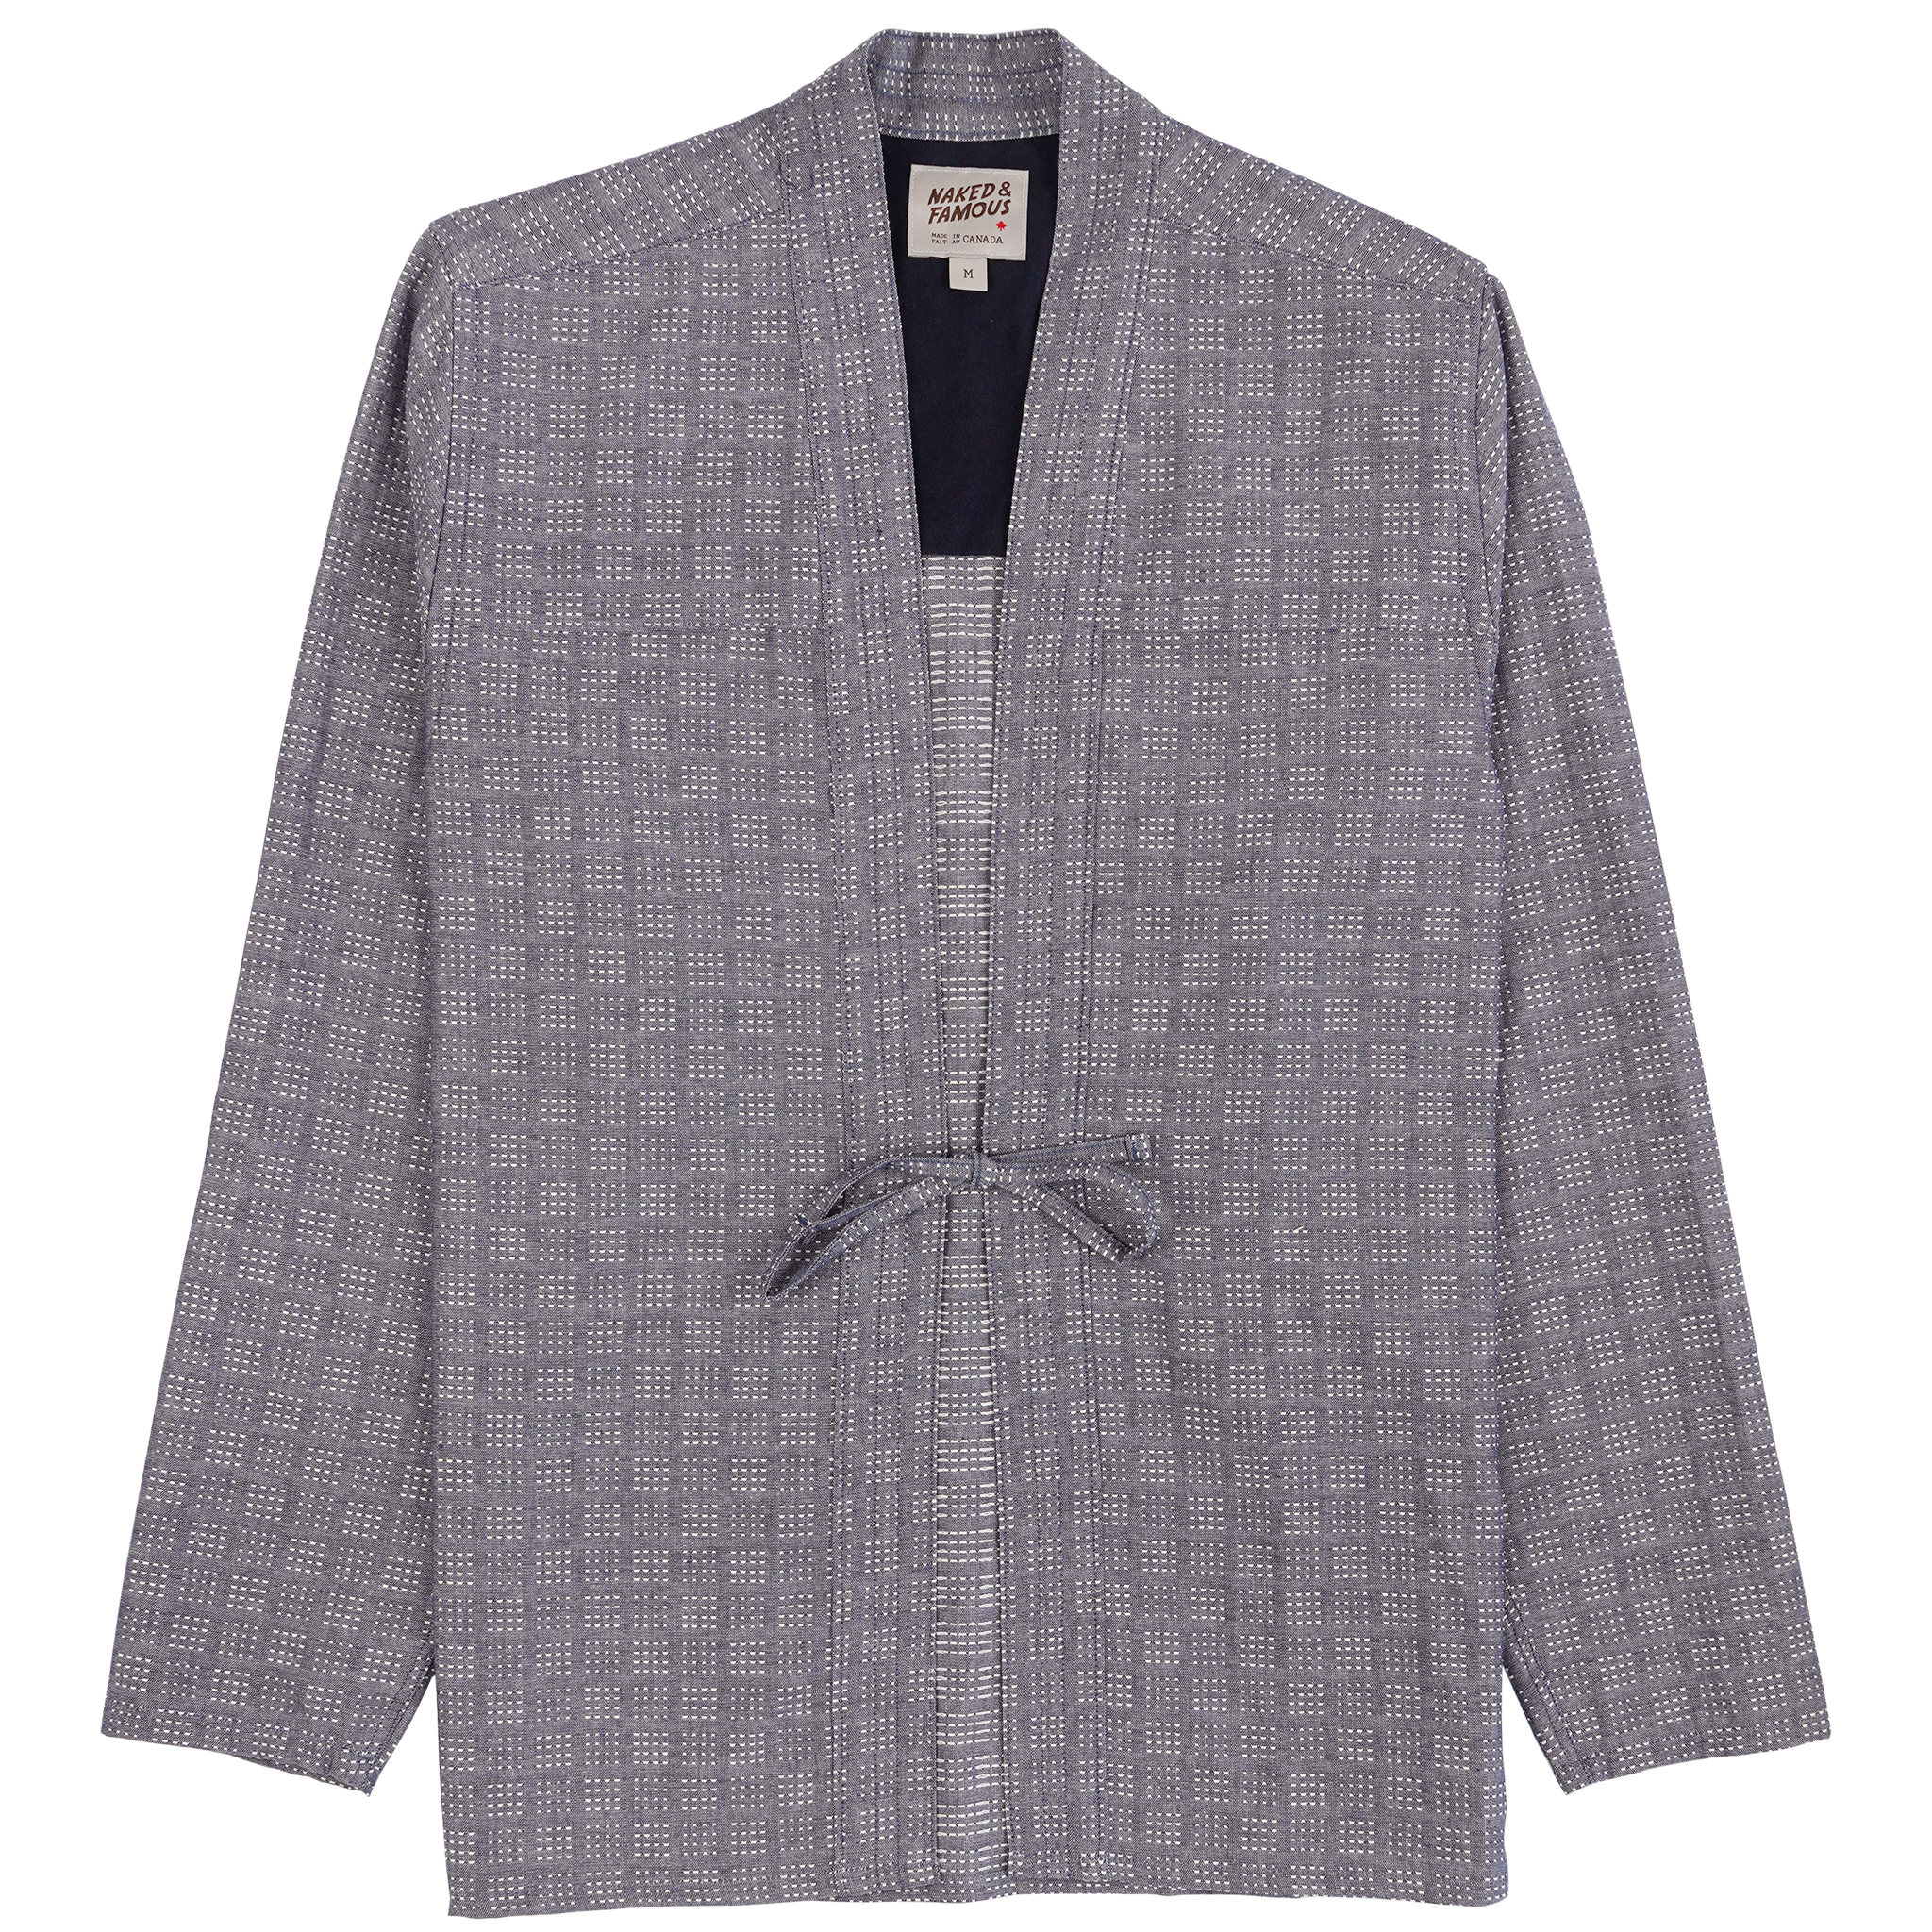 Sashiko Dobby - Chambray - Kimono Shirt